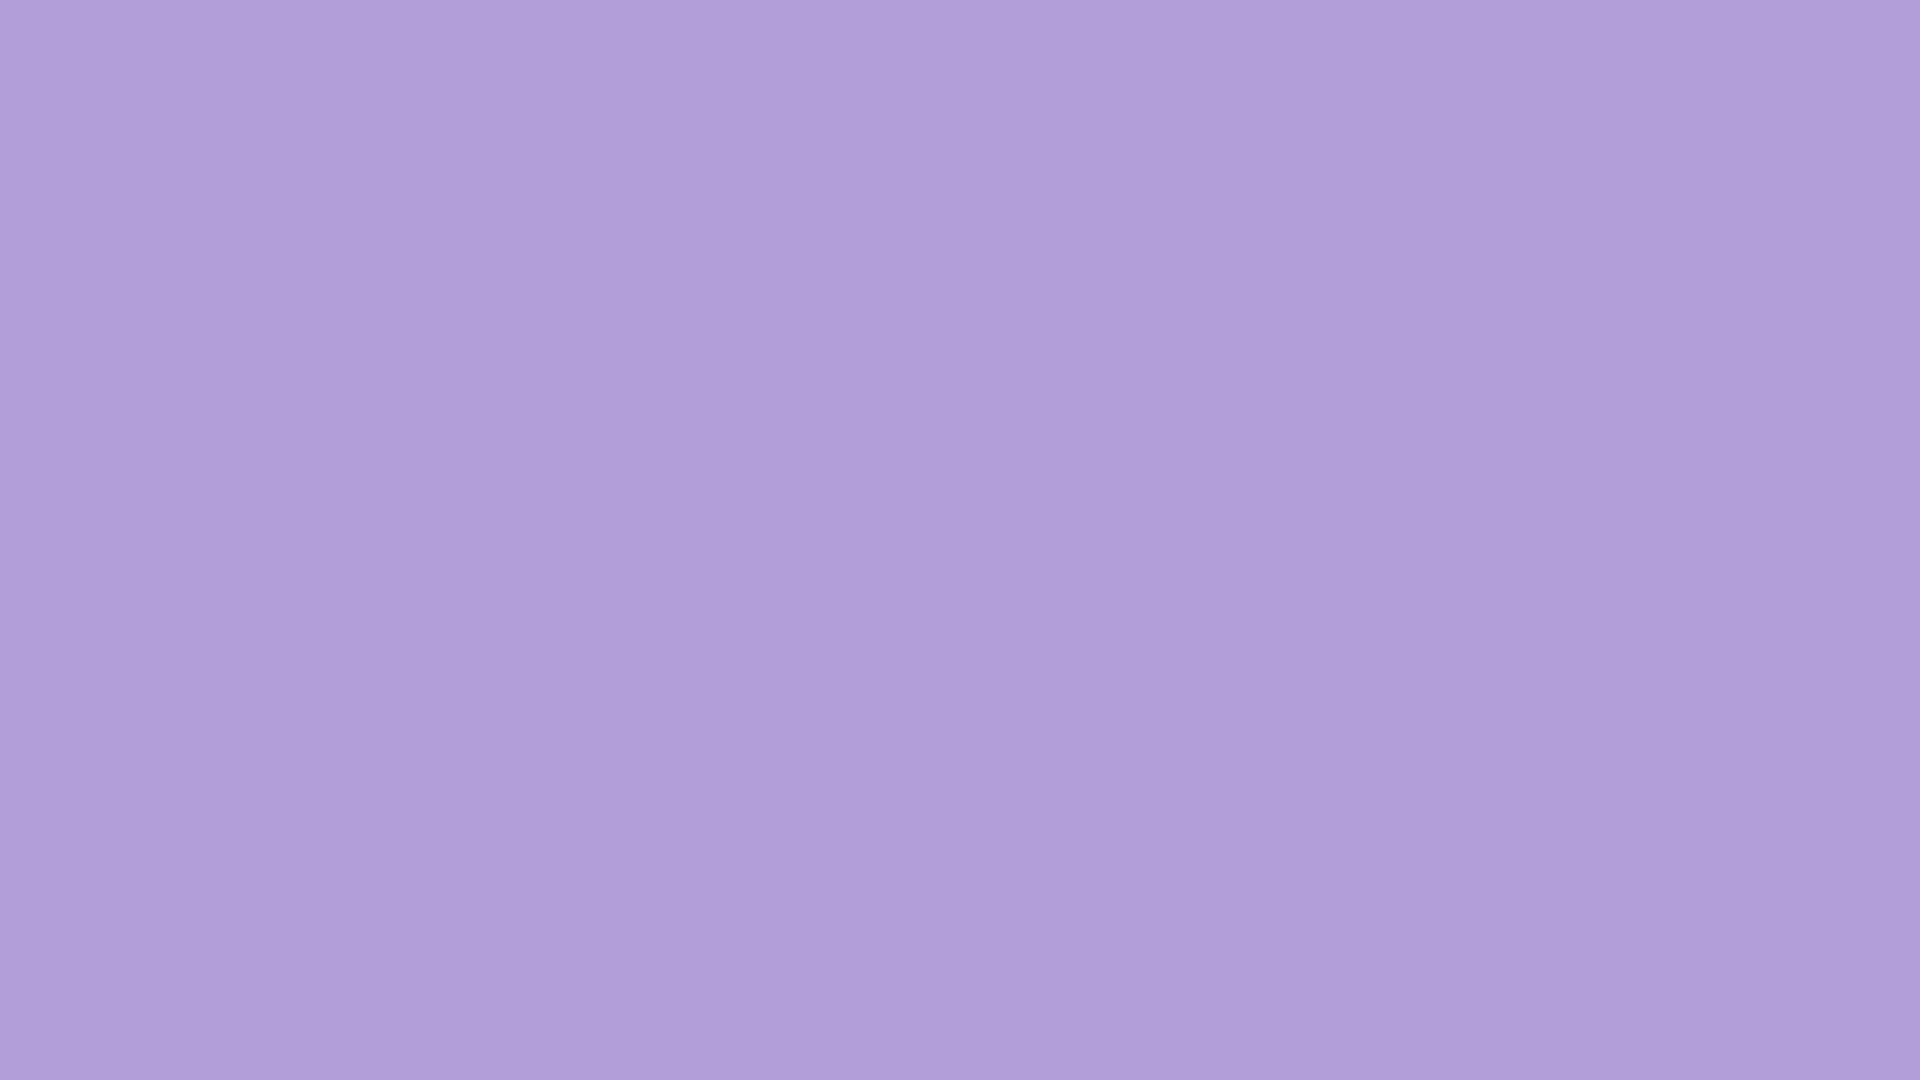 Light Purple Backgrounds - WallpaperSafari